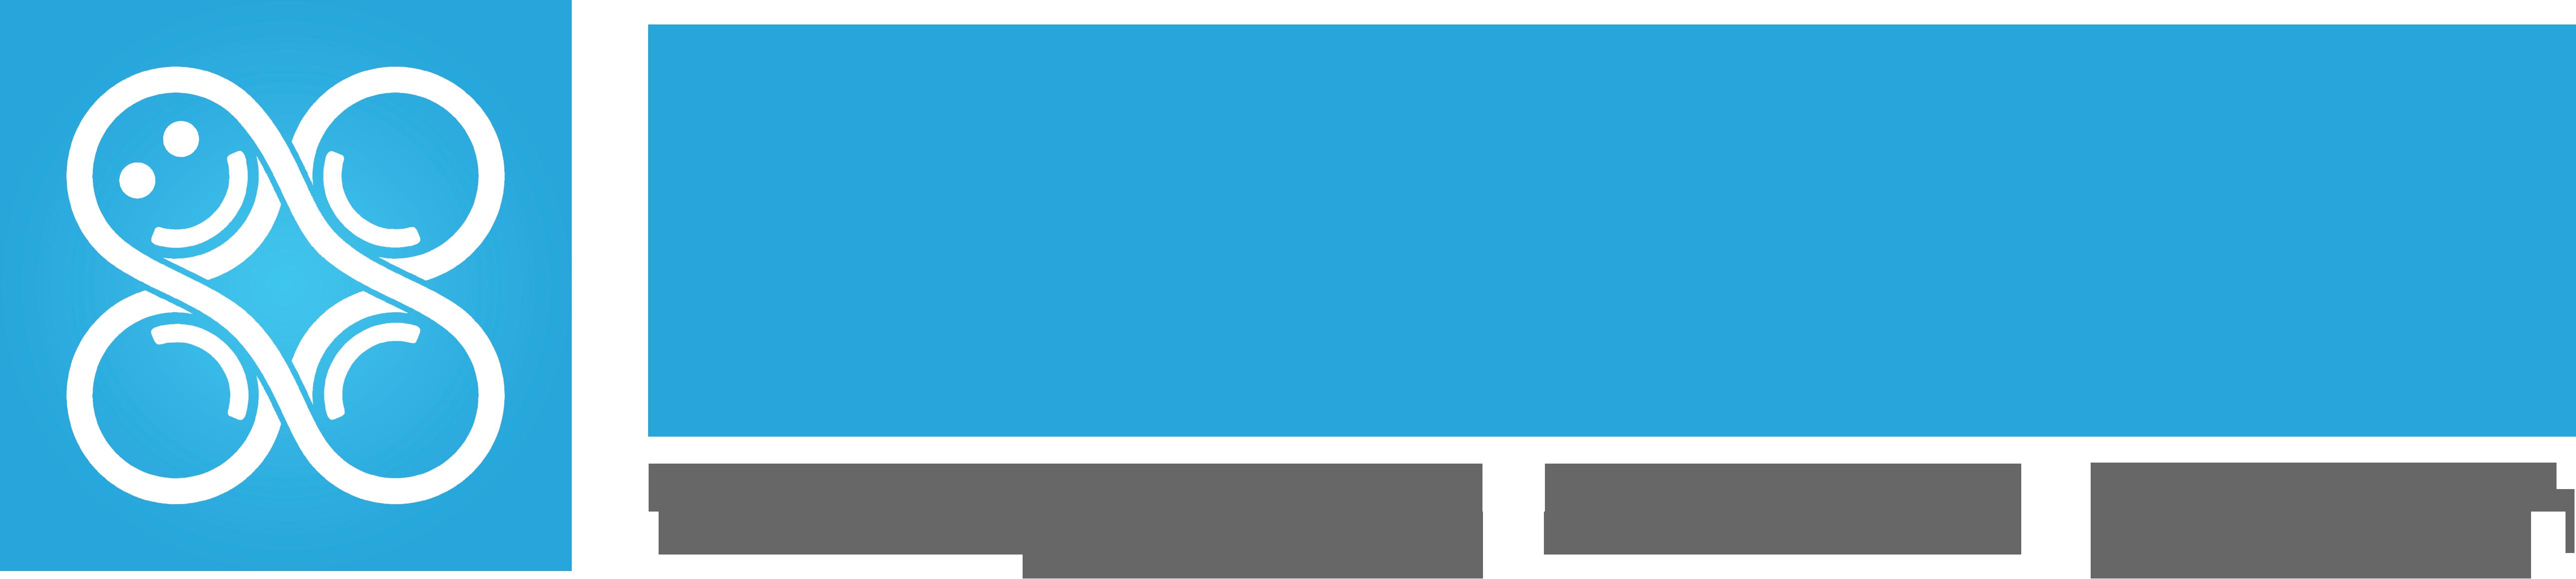 Cloverpop-Logo_20170922.png